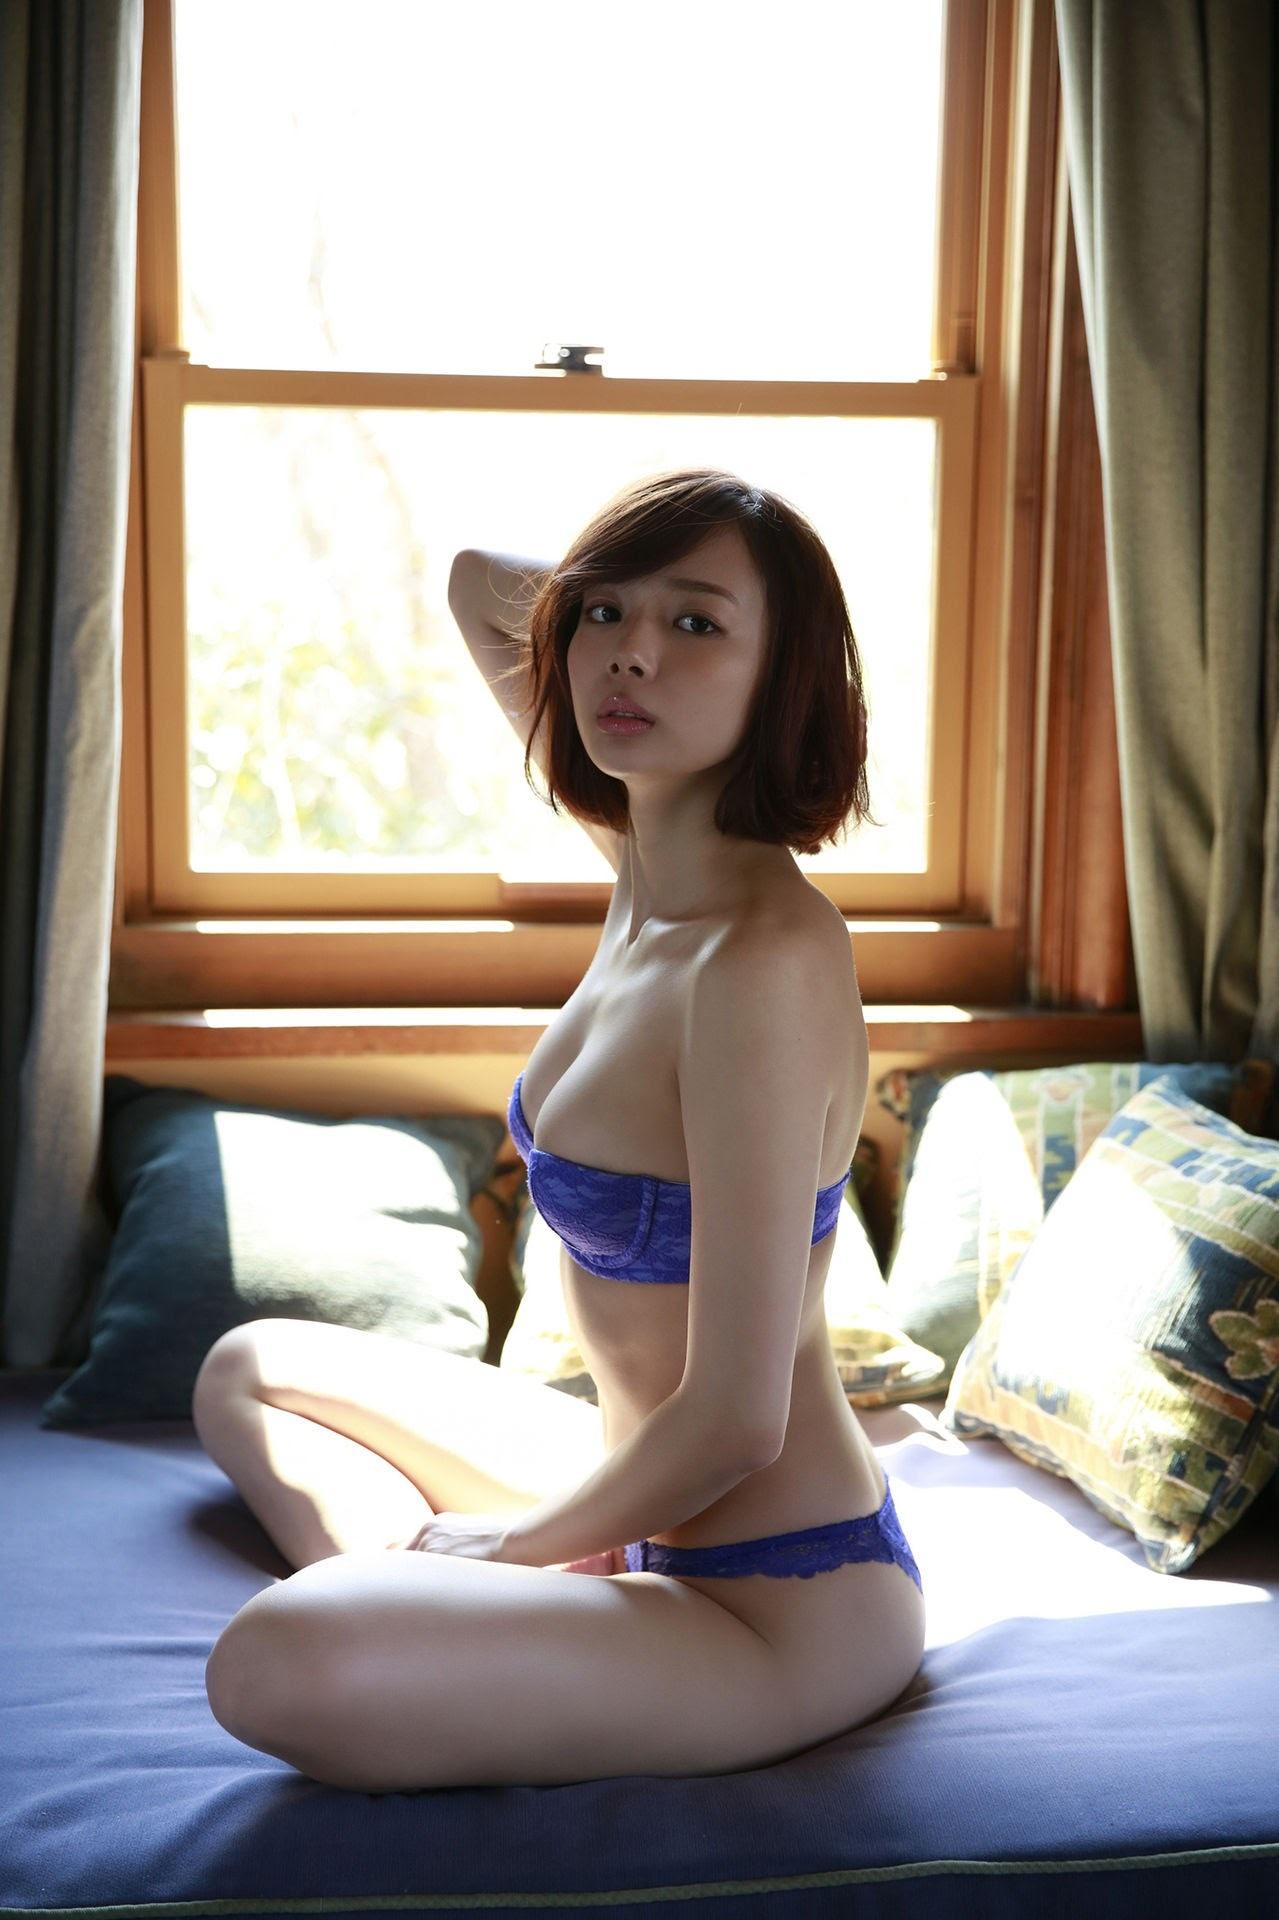 23 years old Shaka Okada, who is also a professional mahjong player022